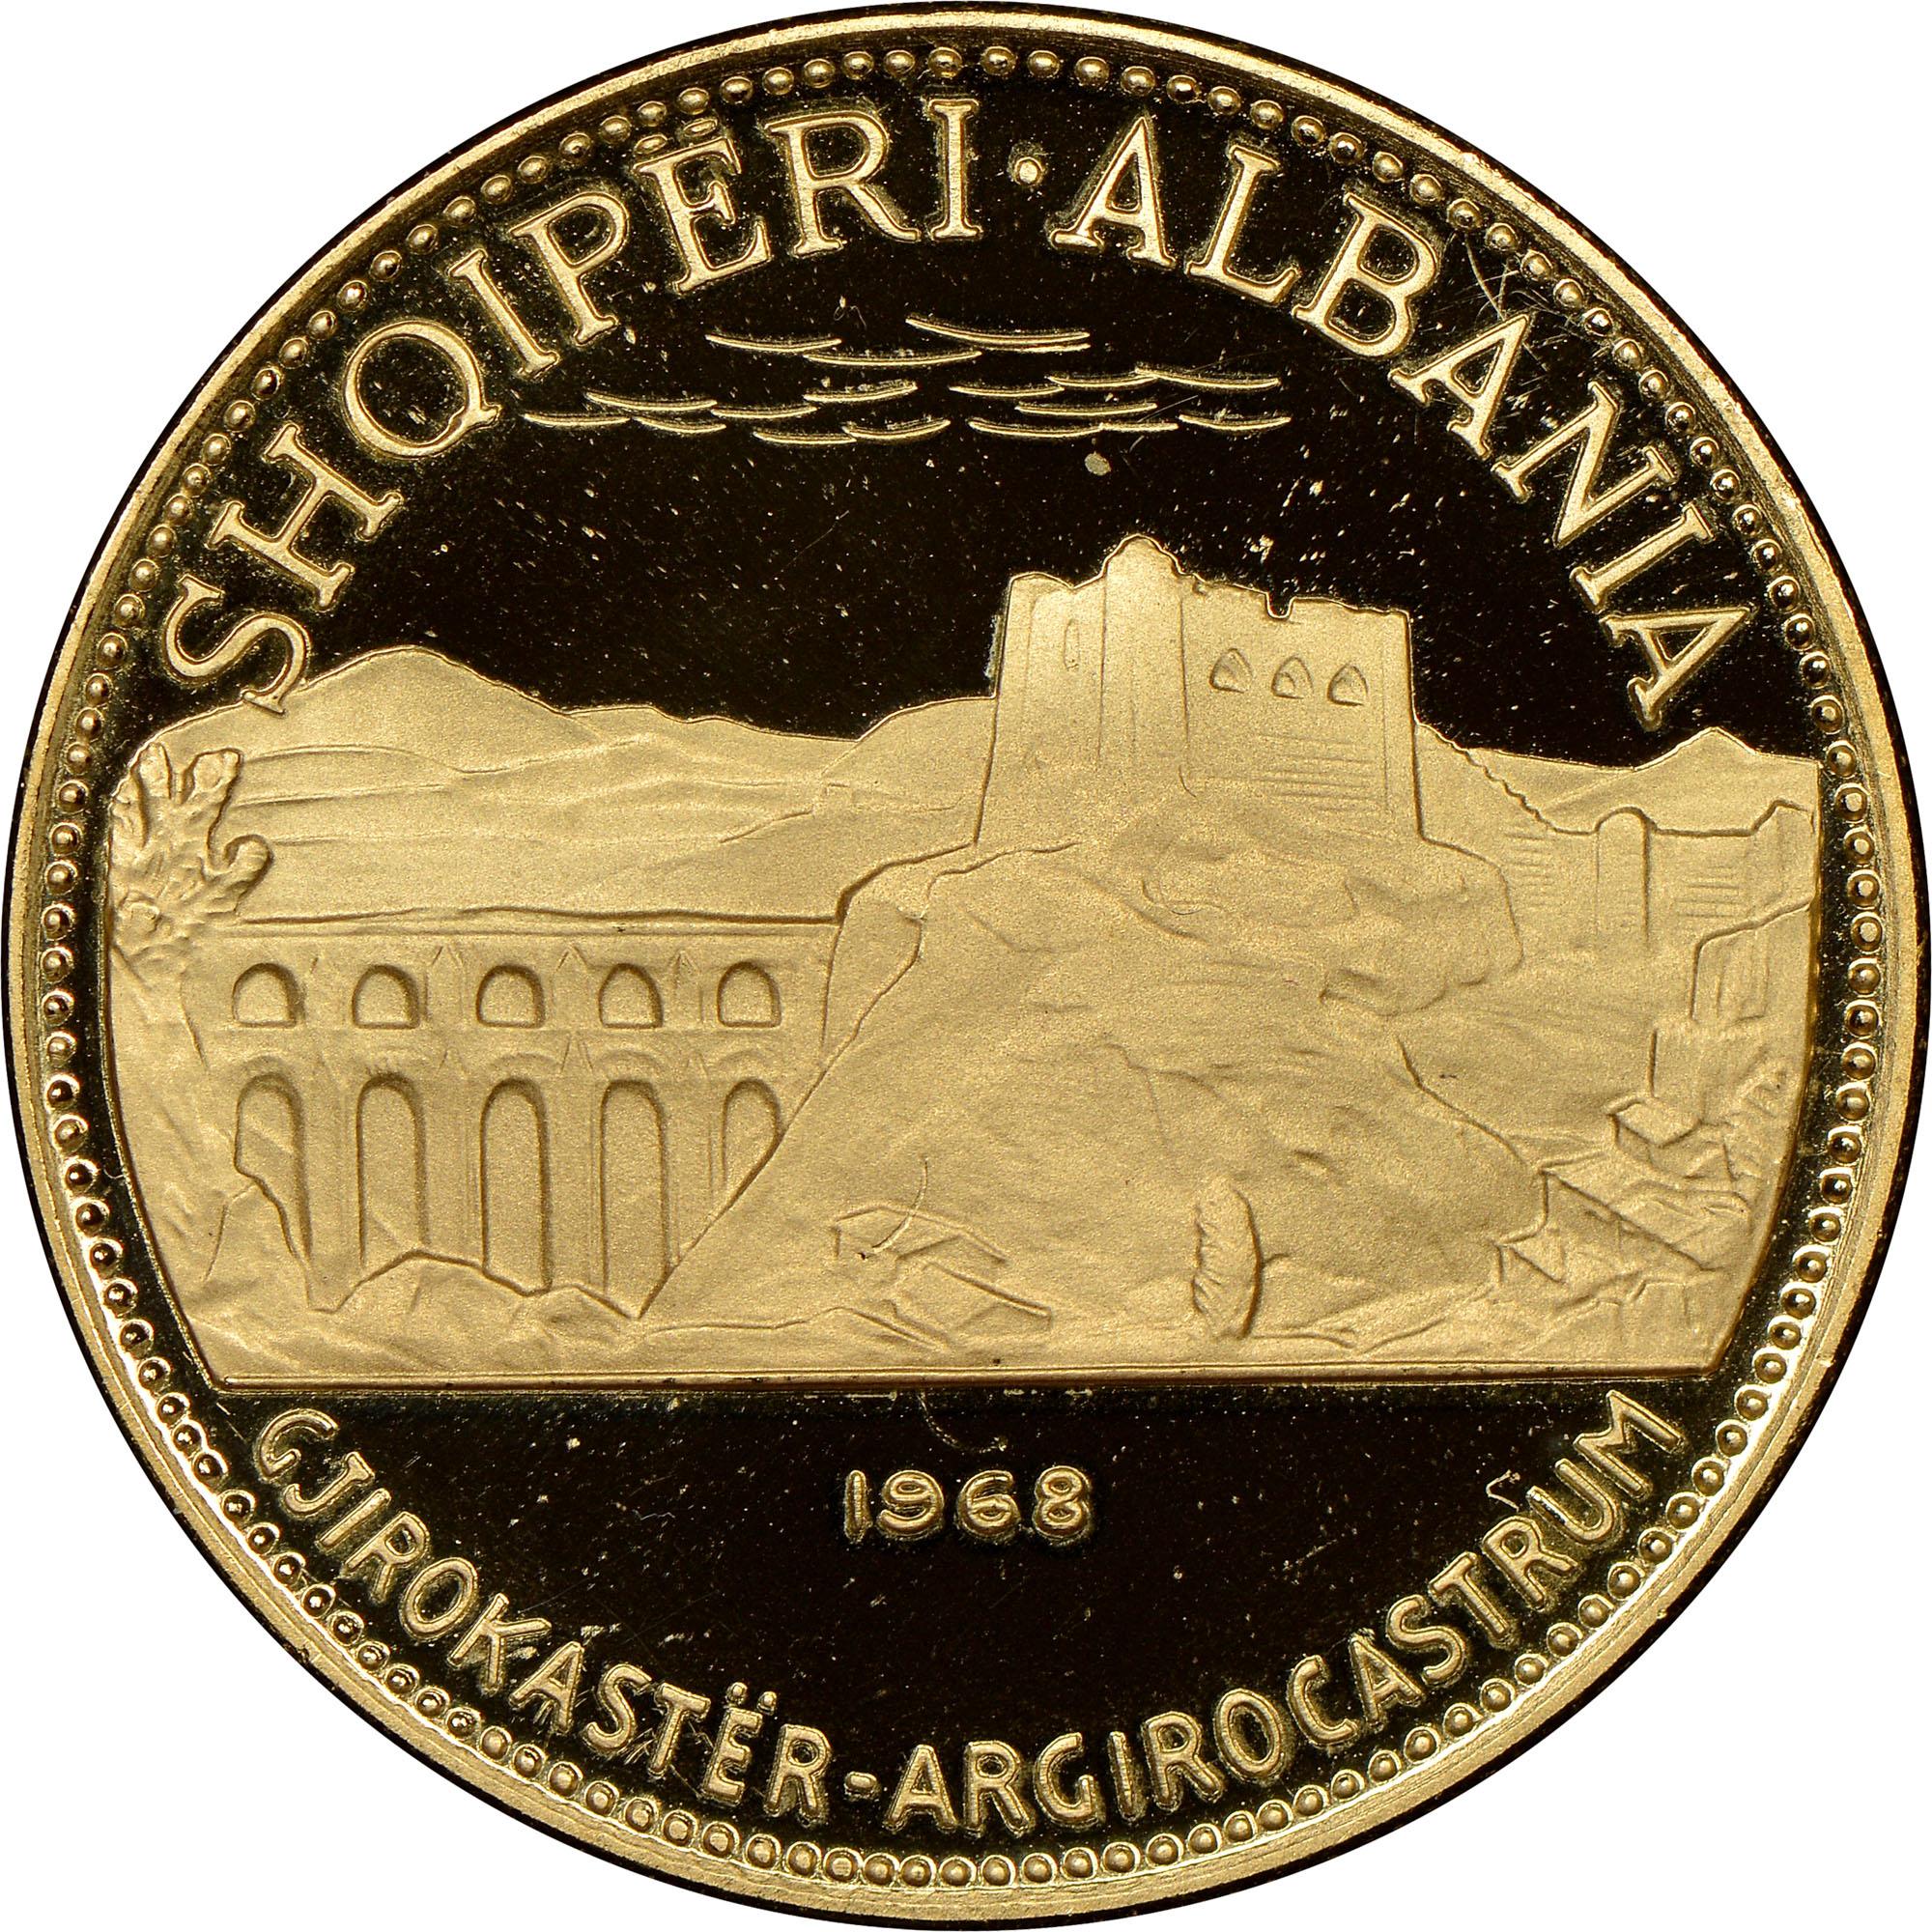 1968 Albania 50 Leke obverse